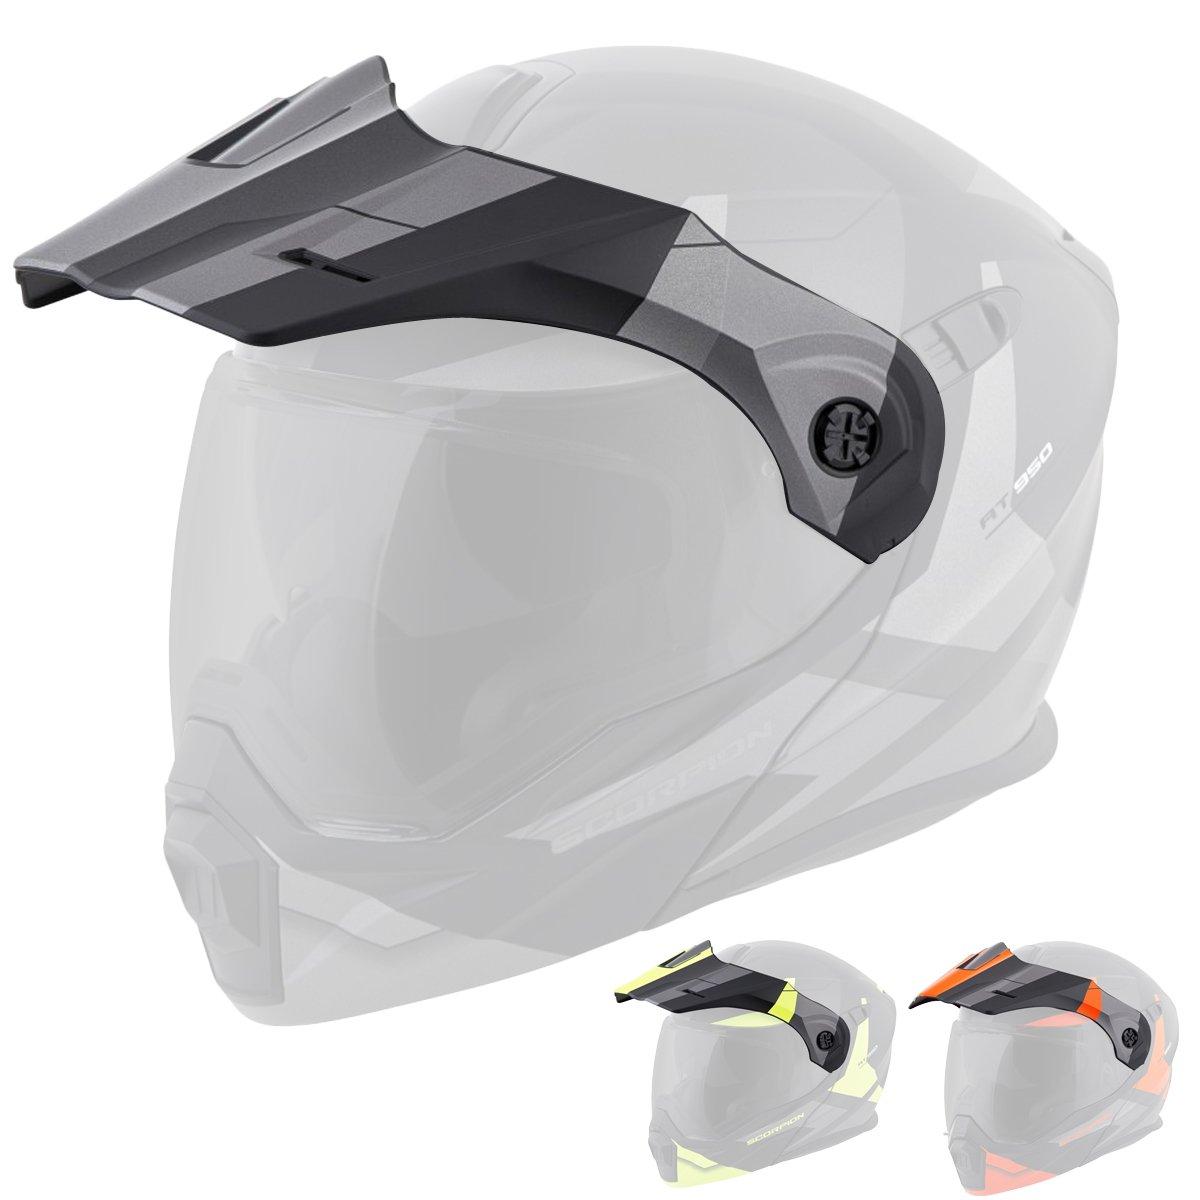 Scorpion Peak Visor Exo-AT950 Motorcycle Helmet Accessories - Matte Black/One Size